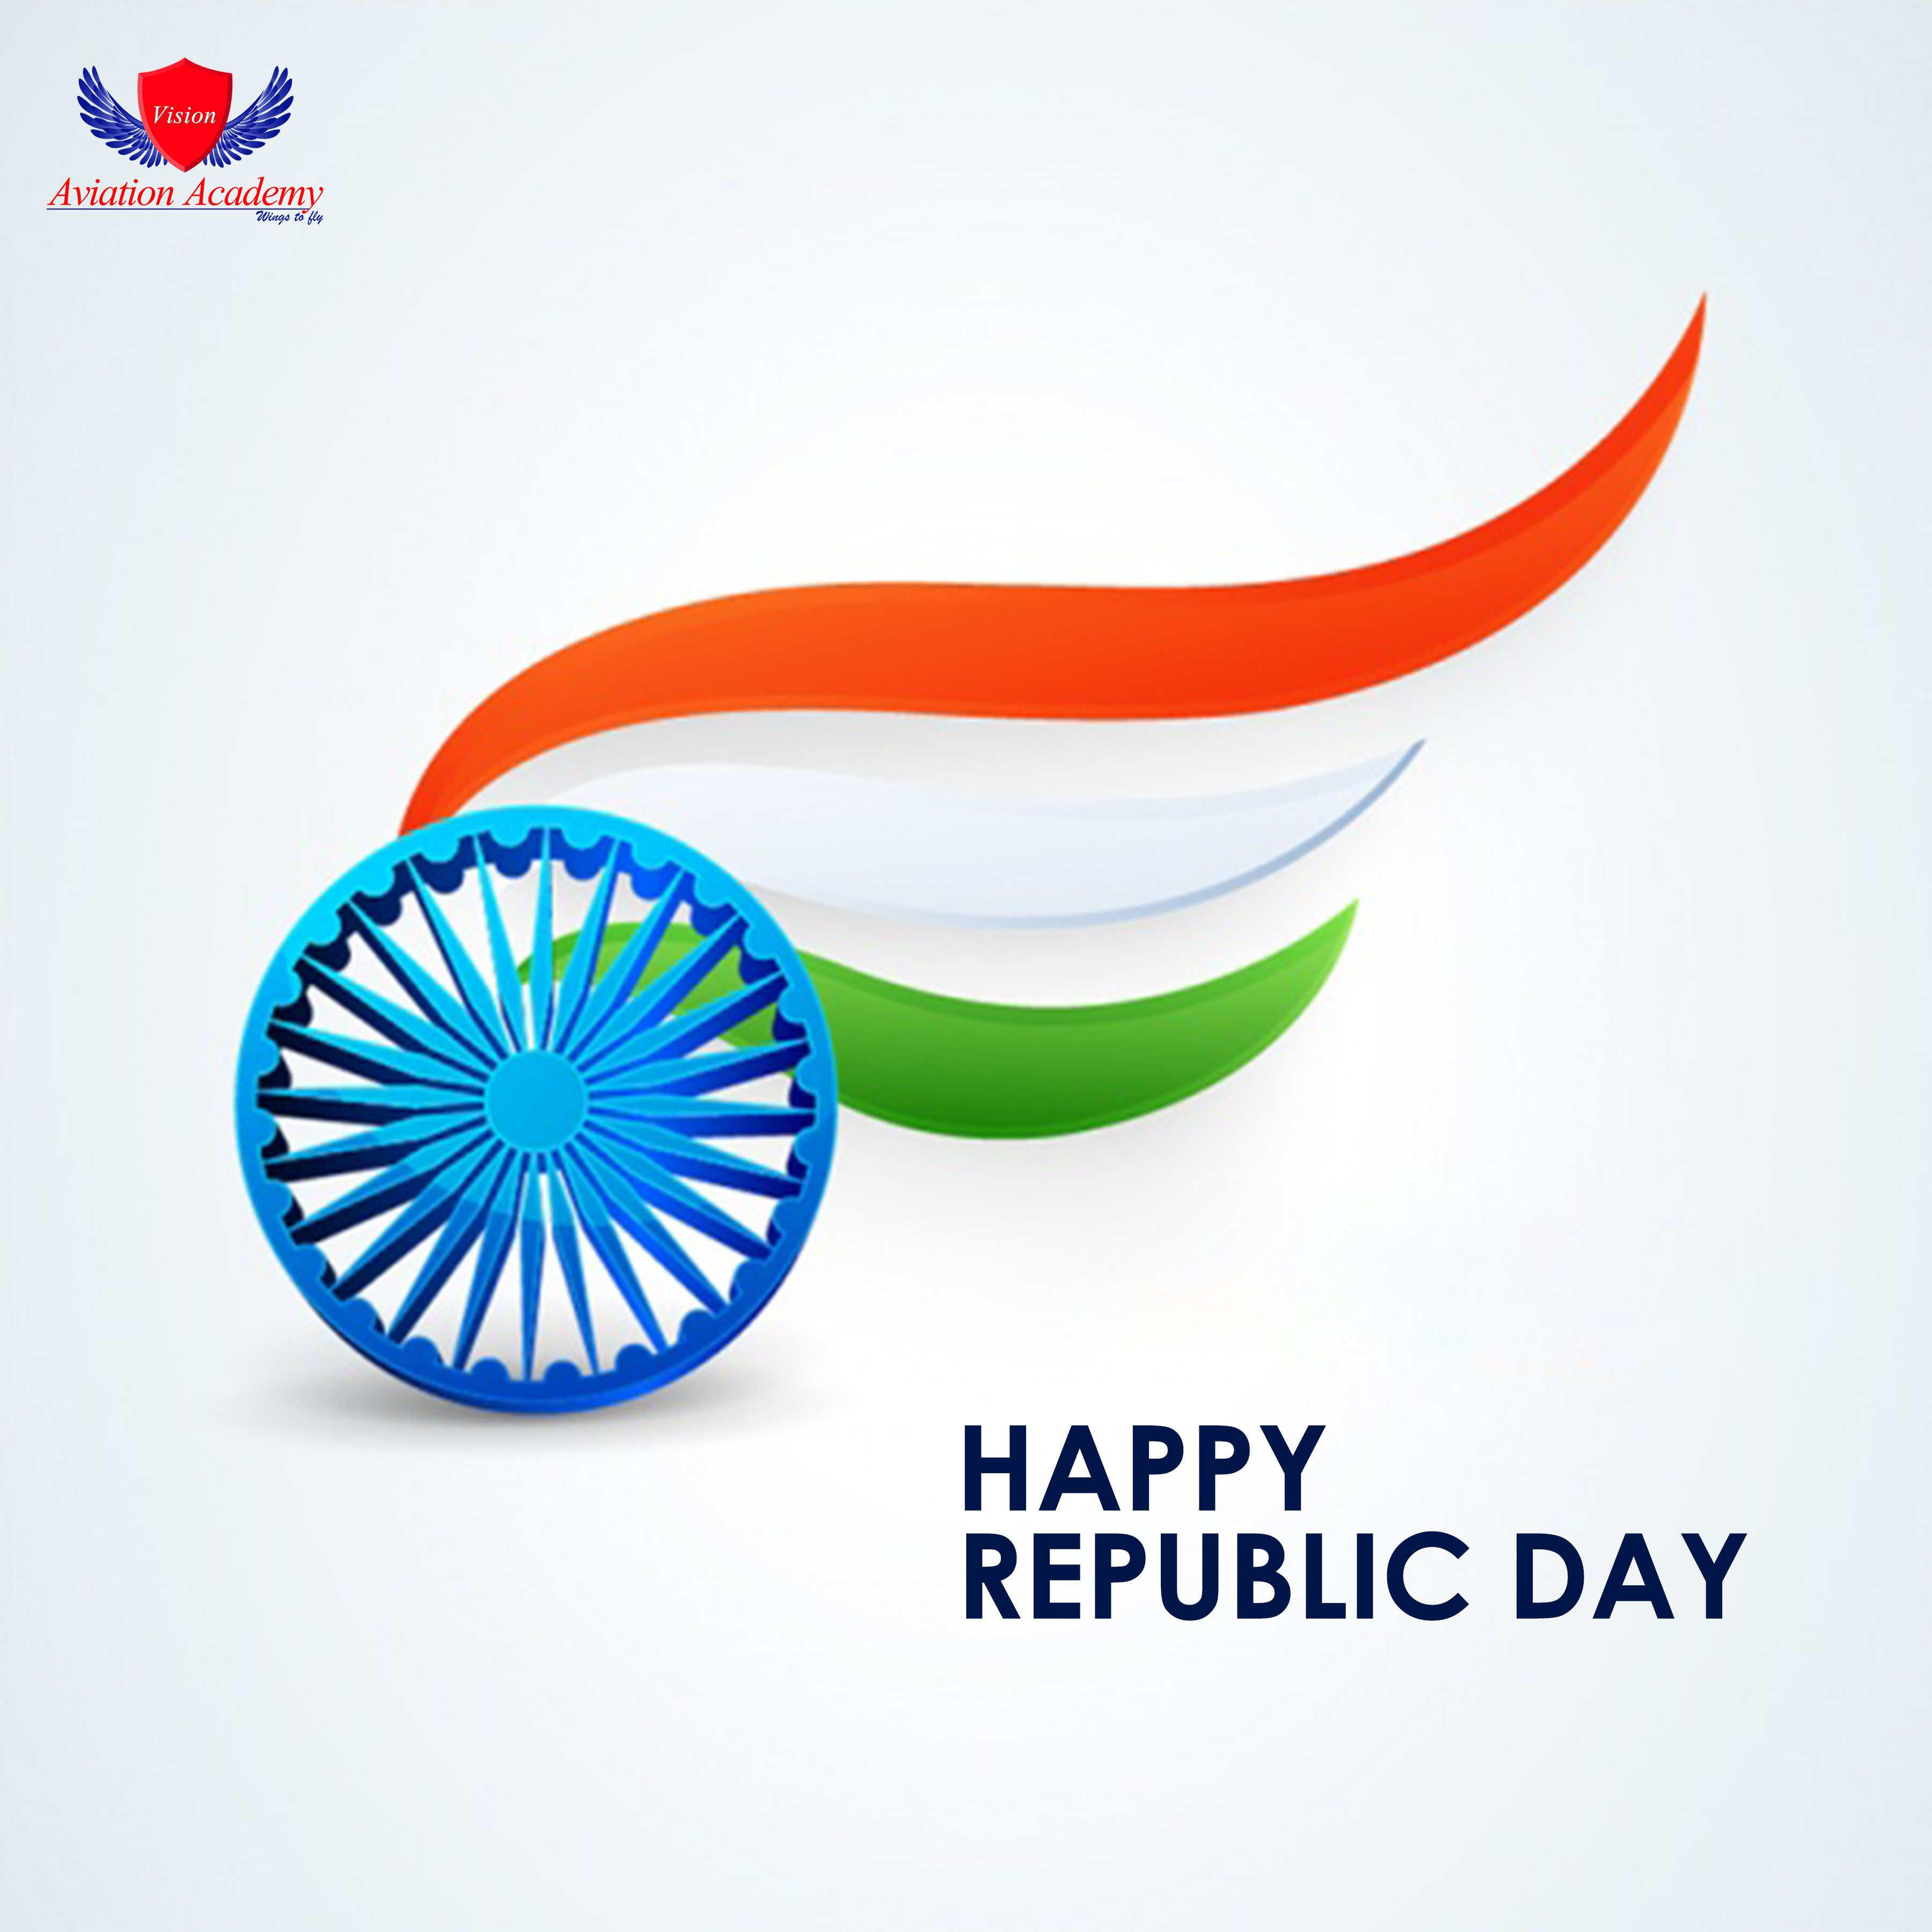 Happy Republic Day India Festival Republicday Flag Republic Day Happy Republic Day Background Republic Day Background